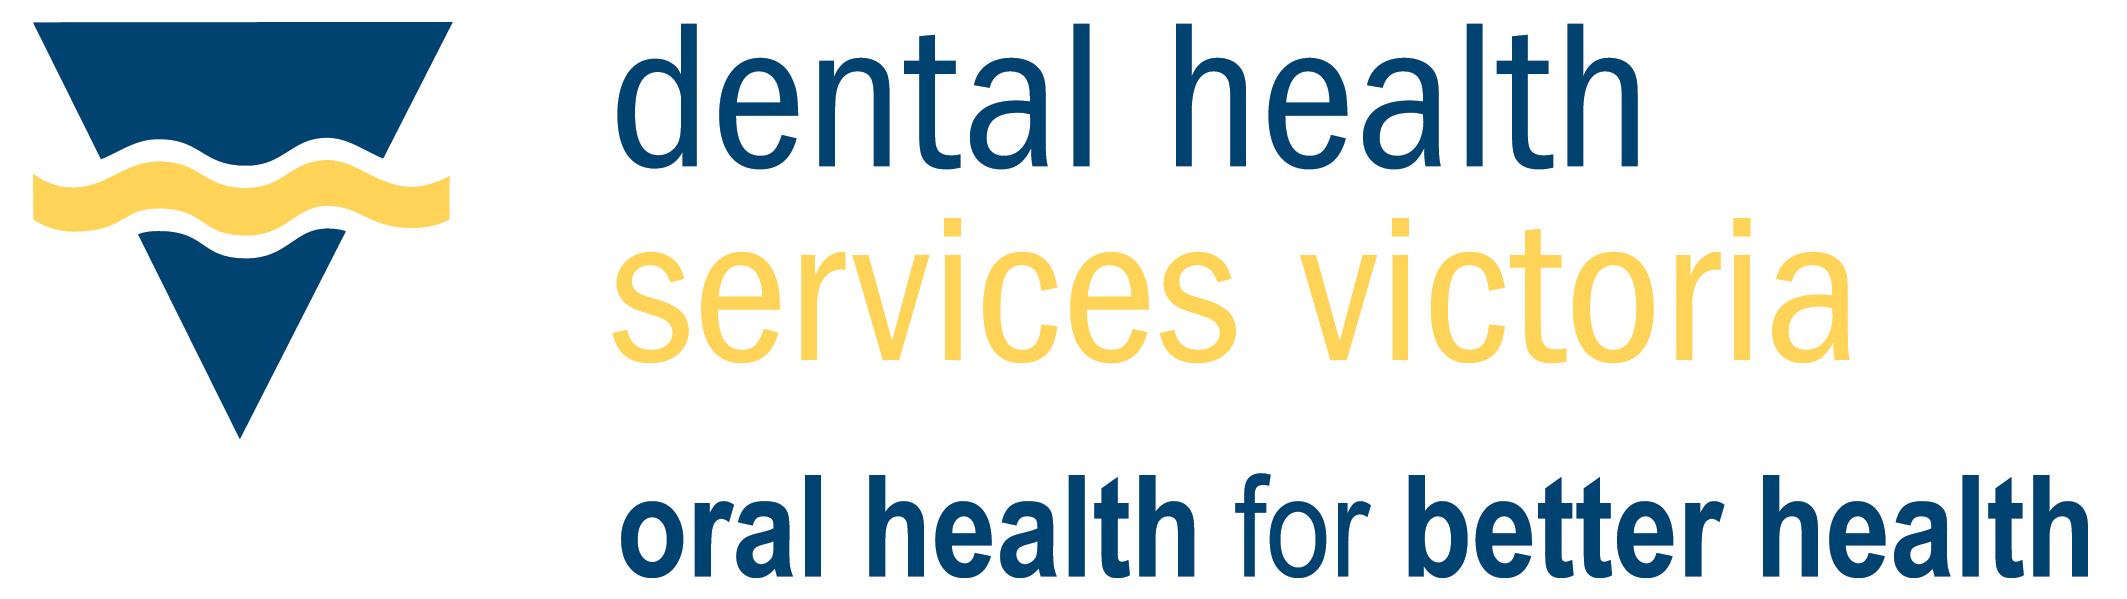 DHSV logo - Oral Health for Better Health